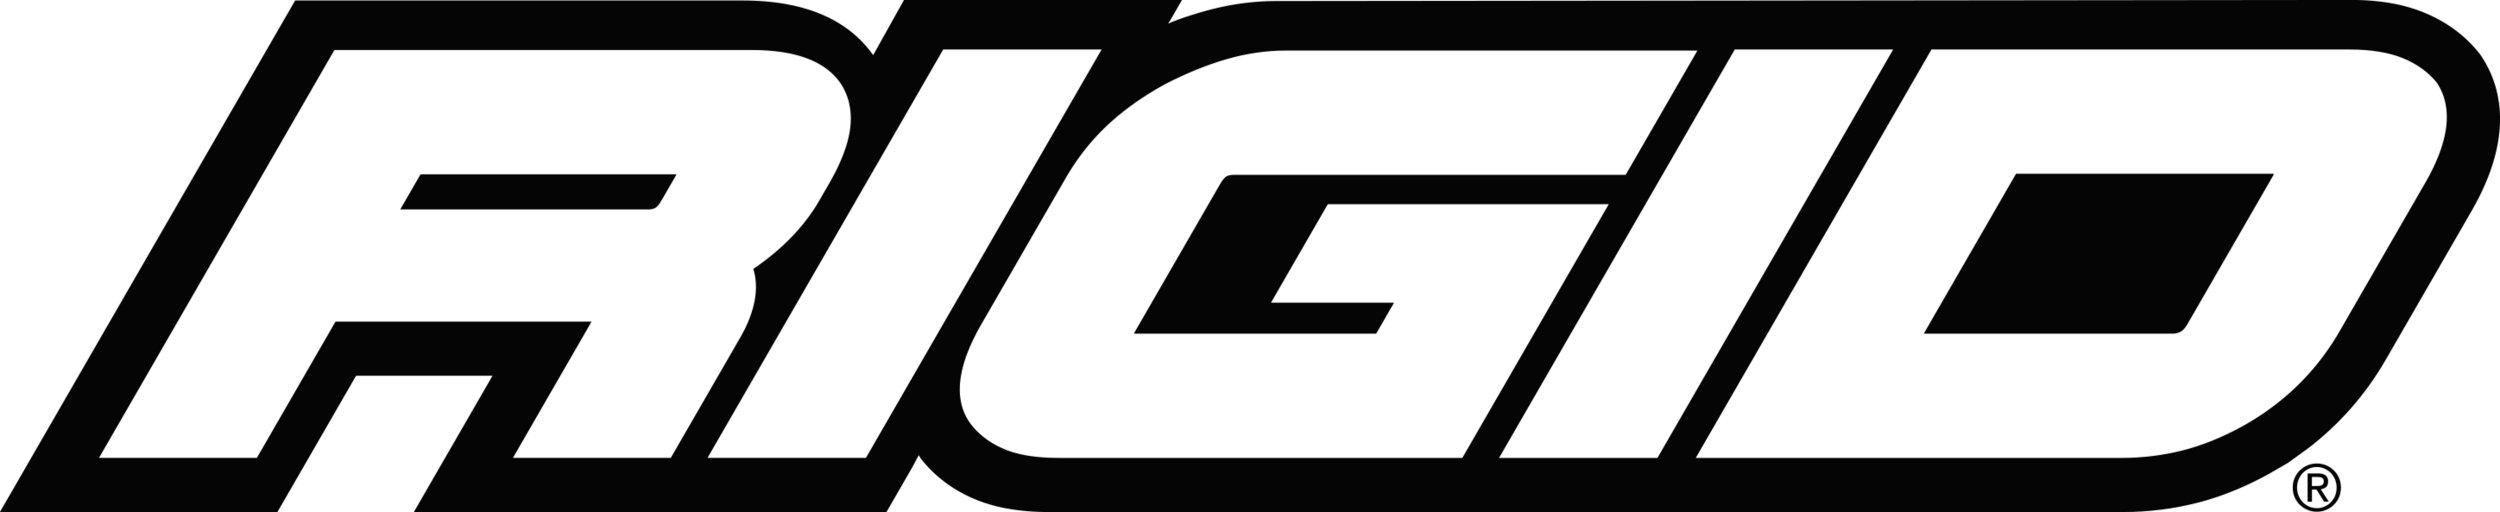 RIGID_Logo_Outlined.jpg